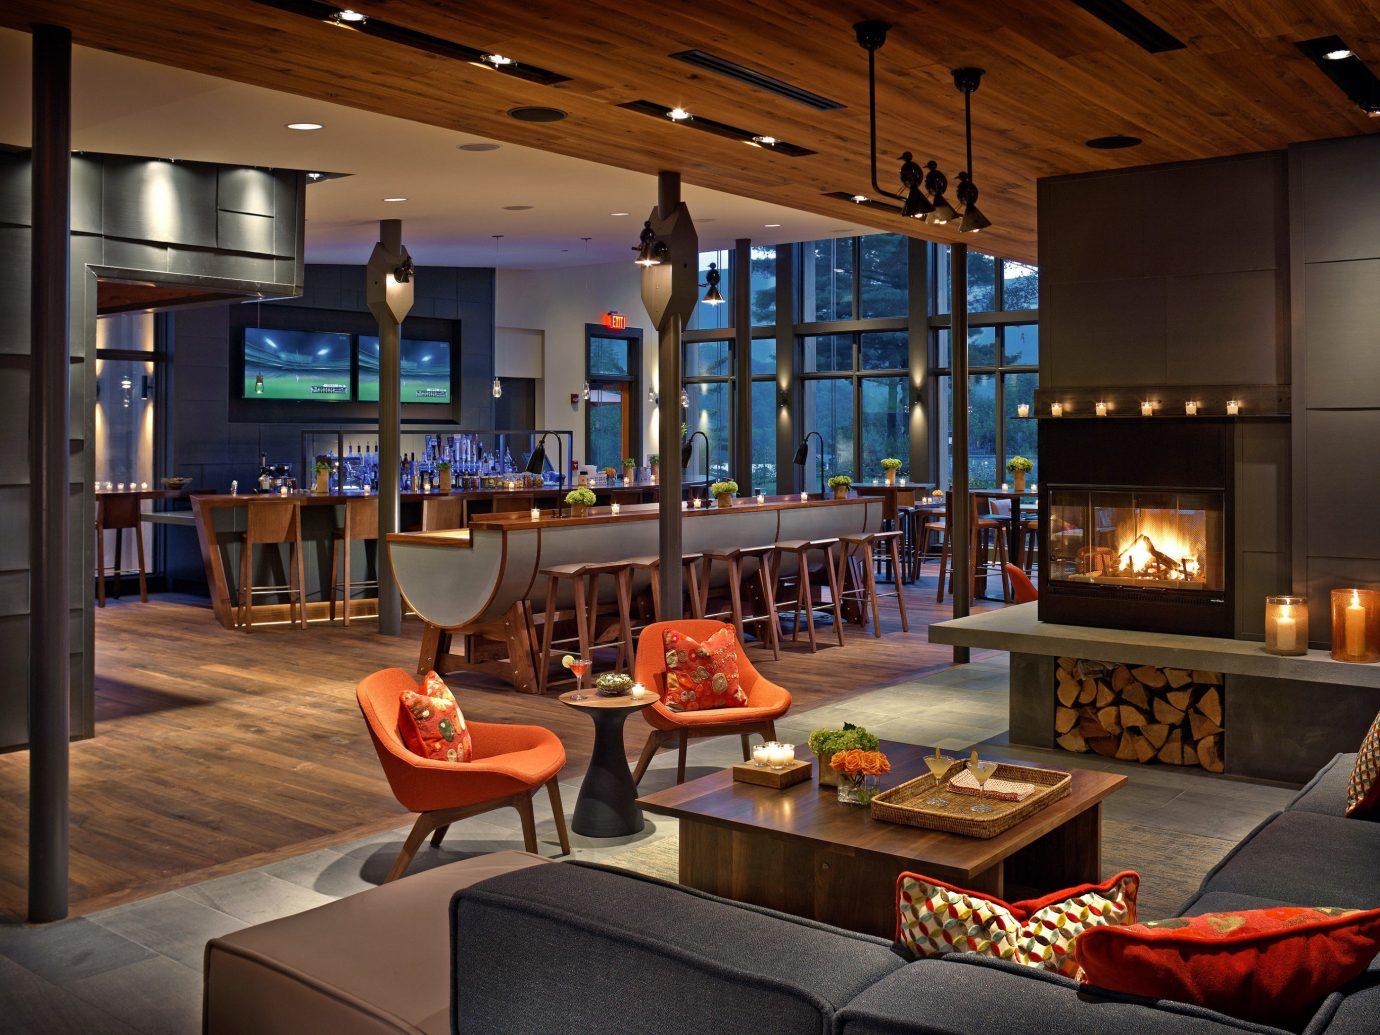 Bar Country Dining Drink Eat Lodge Resort Trip Ideas indoor ceiling room recreation room Lobby living room estate home interior design billiard room Design orange area furniture